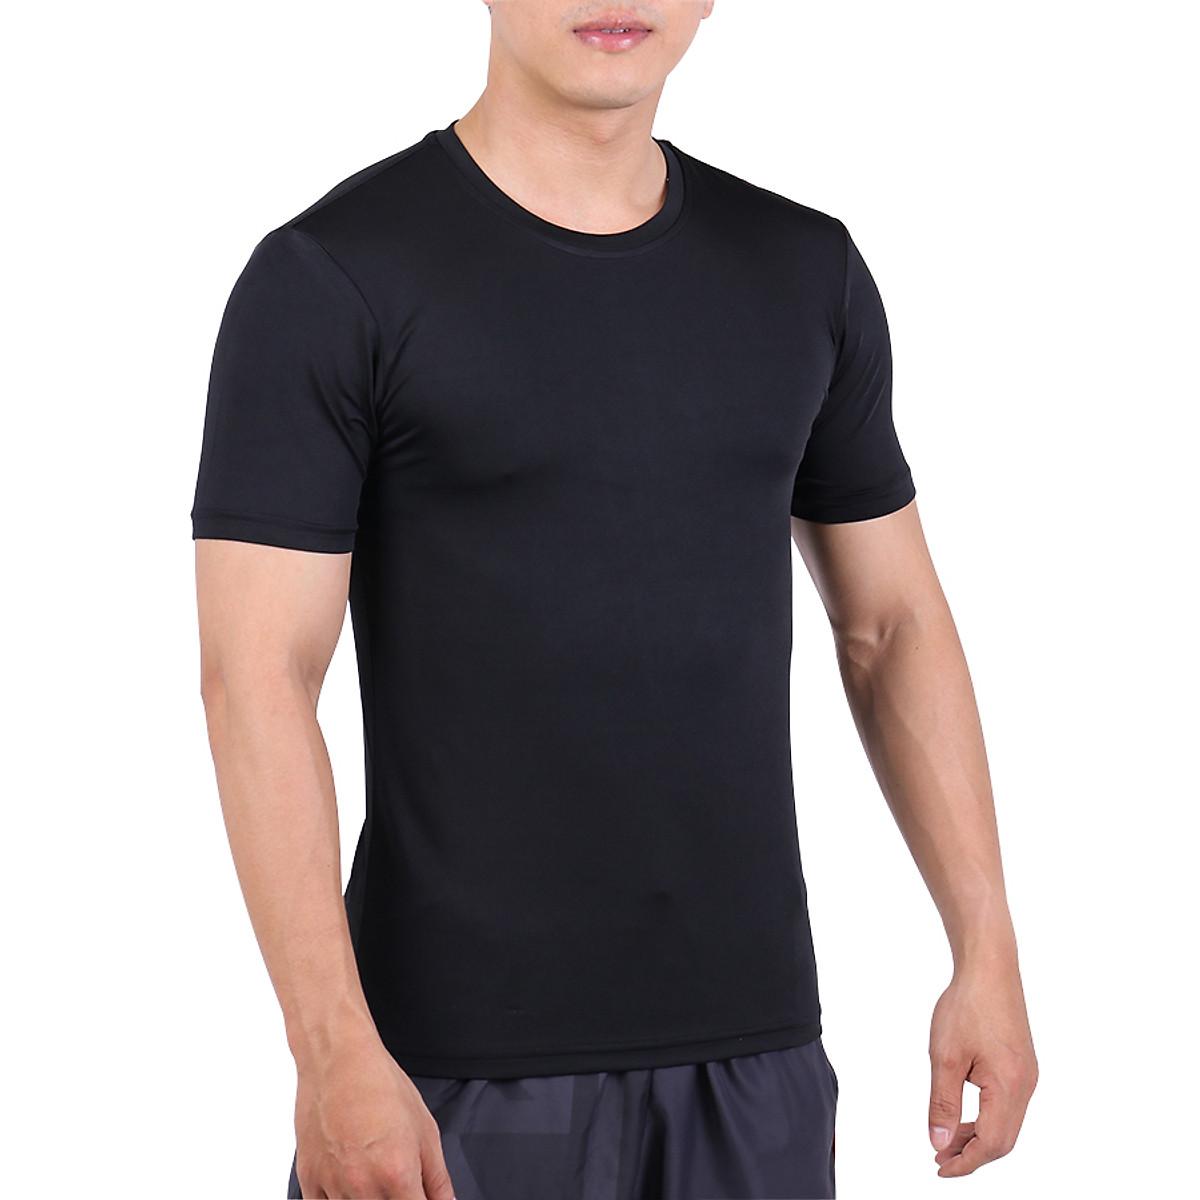 Áo Body Tập Gym Nam Tay Ngắn Unique Apparel ABTND - Đen